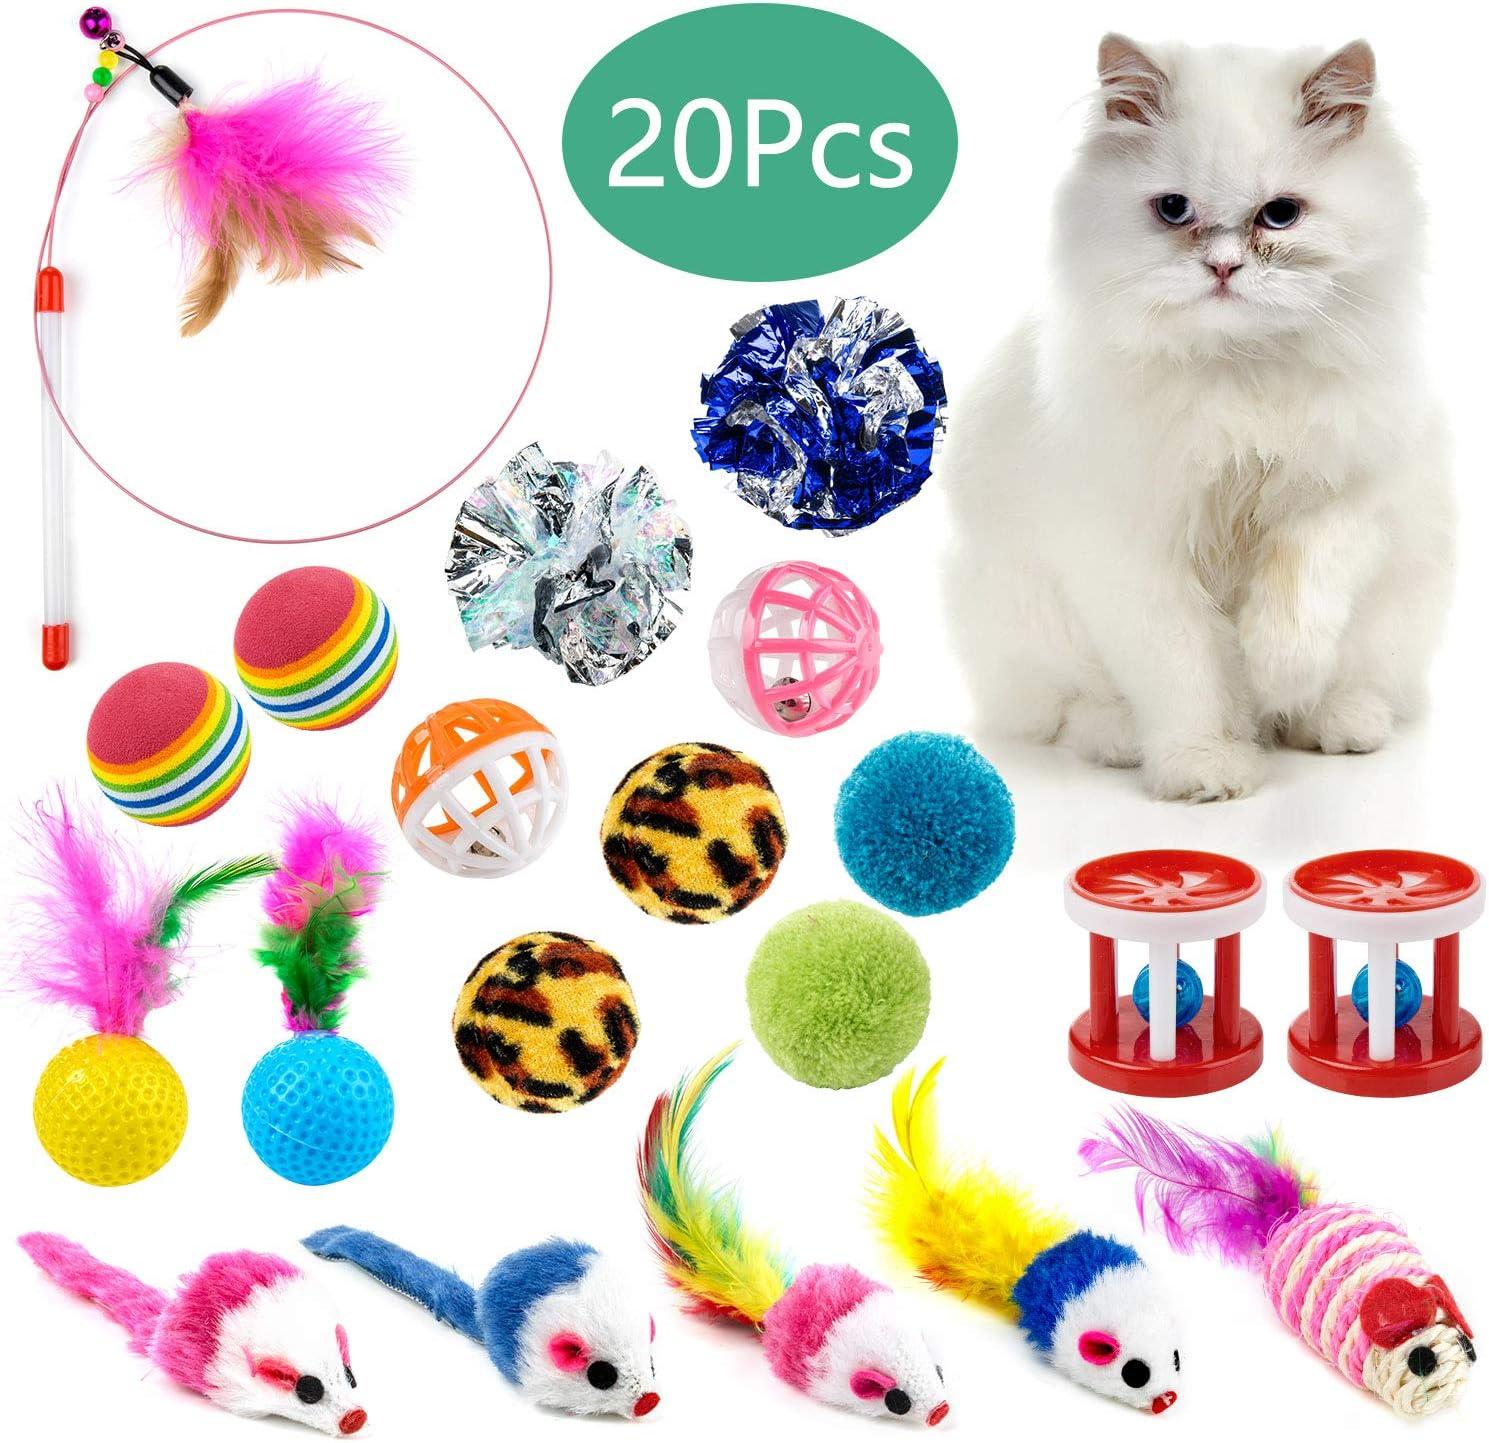 WolinTek 20 Piezas Juguetes para Gatos, Juguete Interactivo con ...